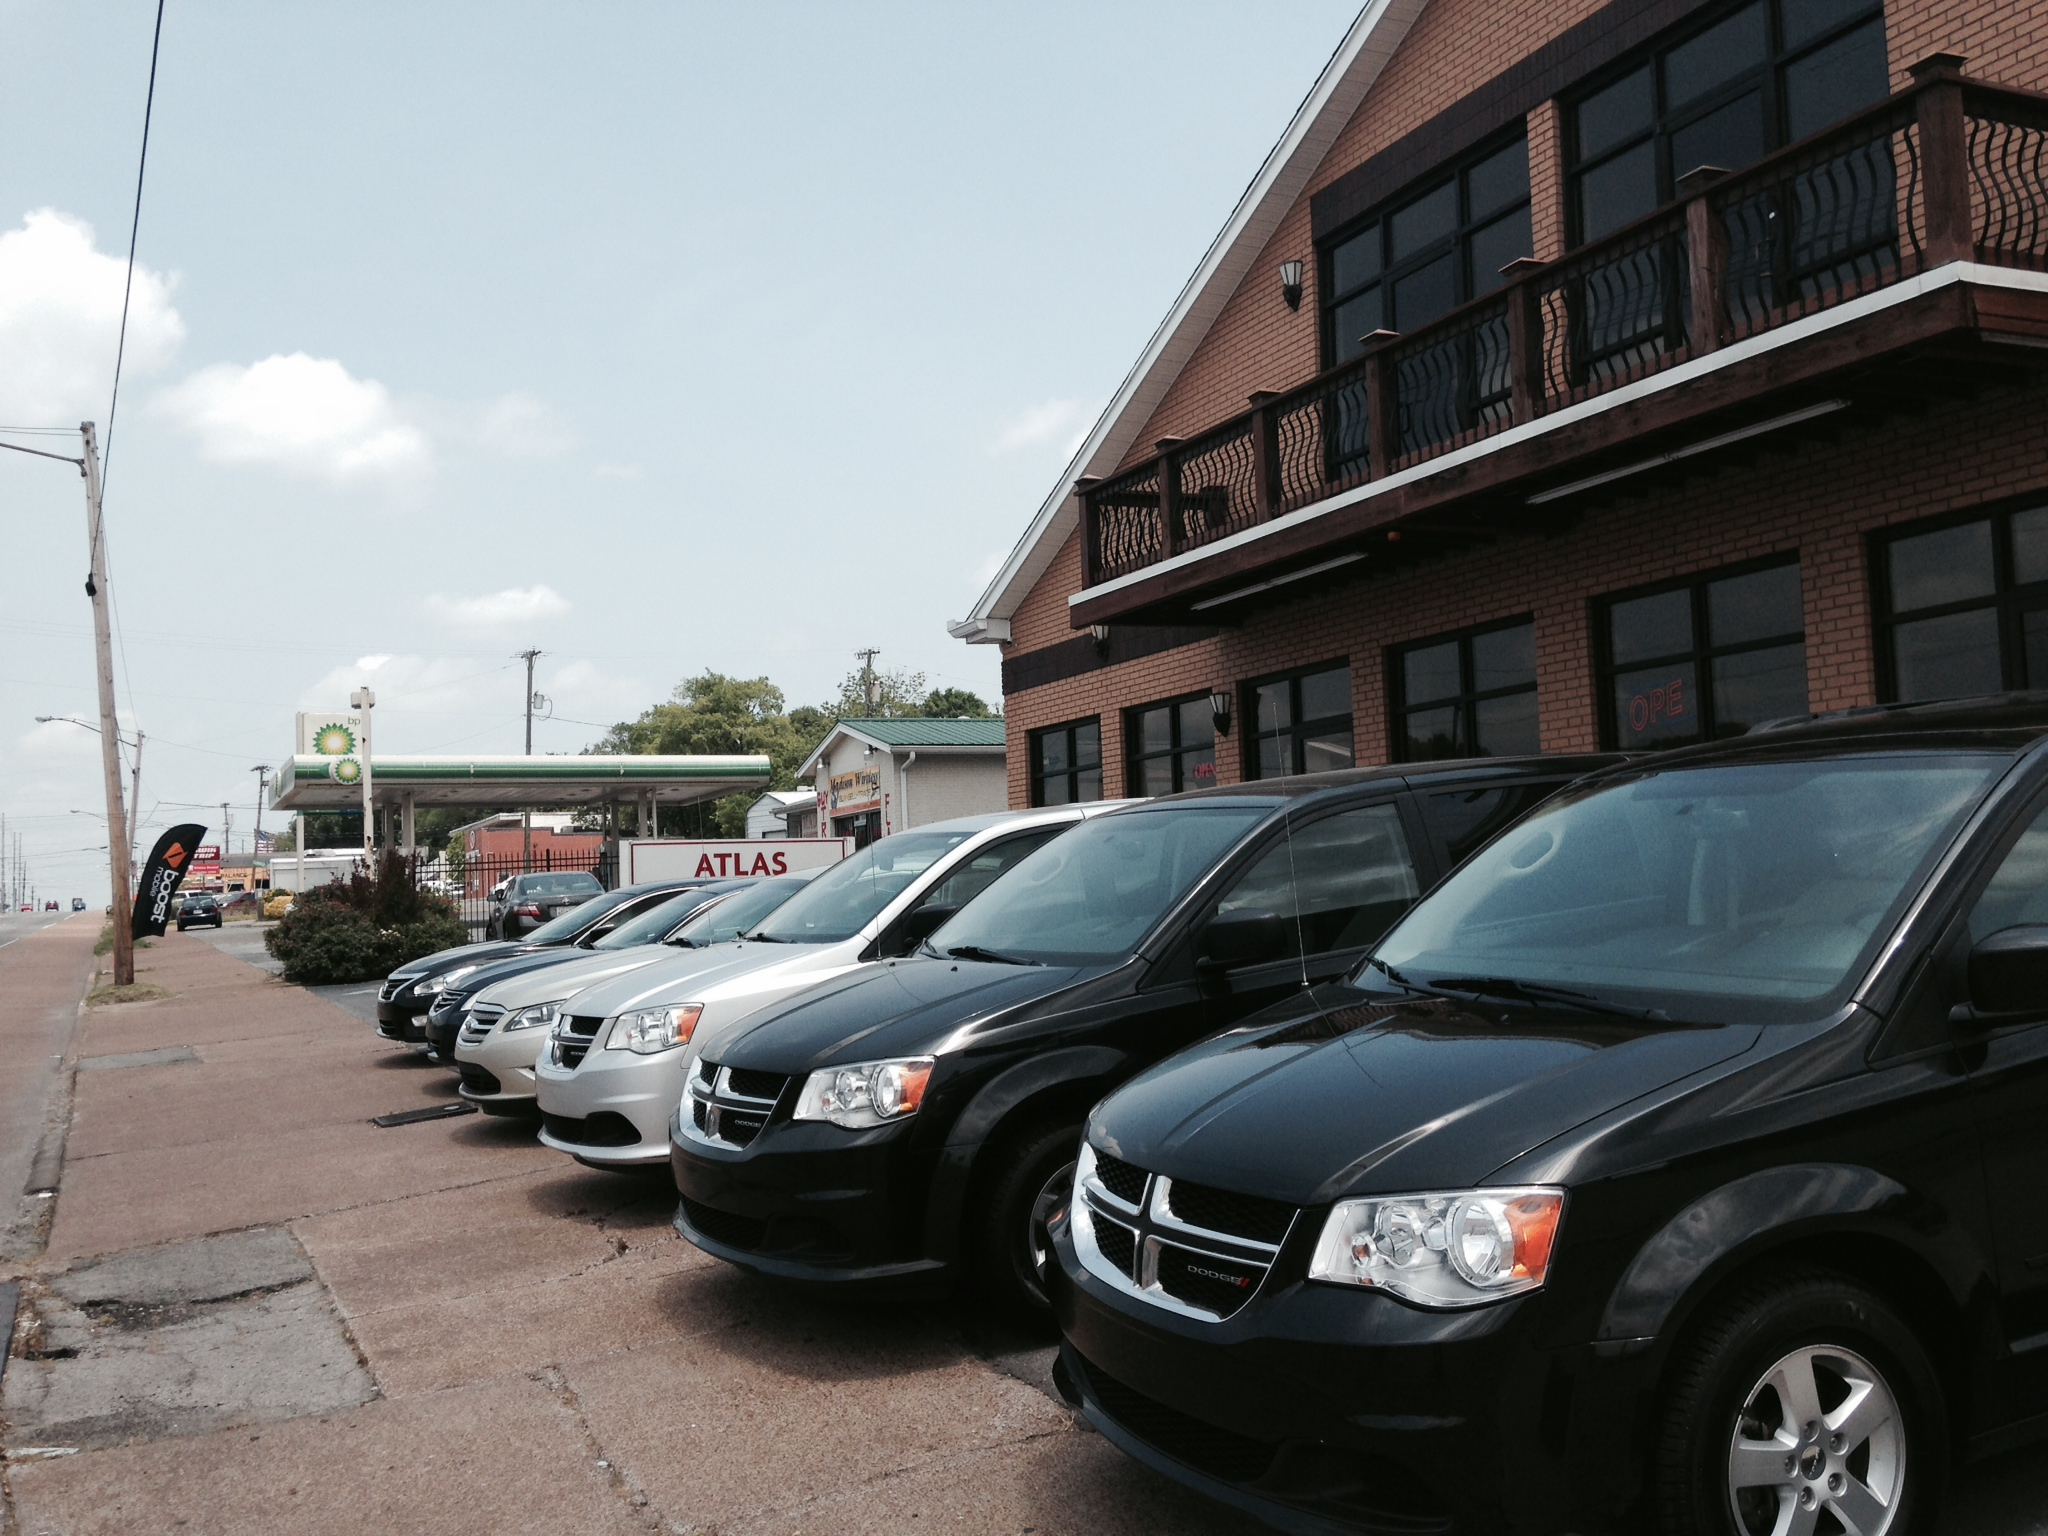 Atlas Discount Car & Van Rental